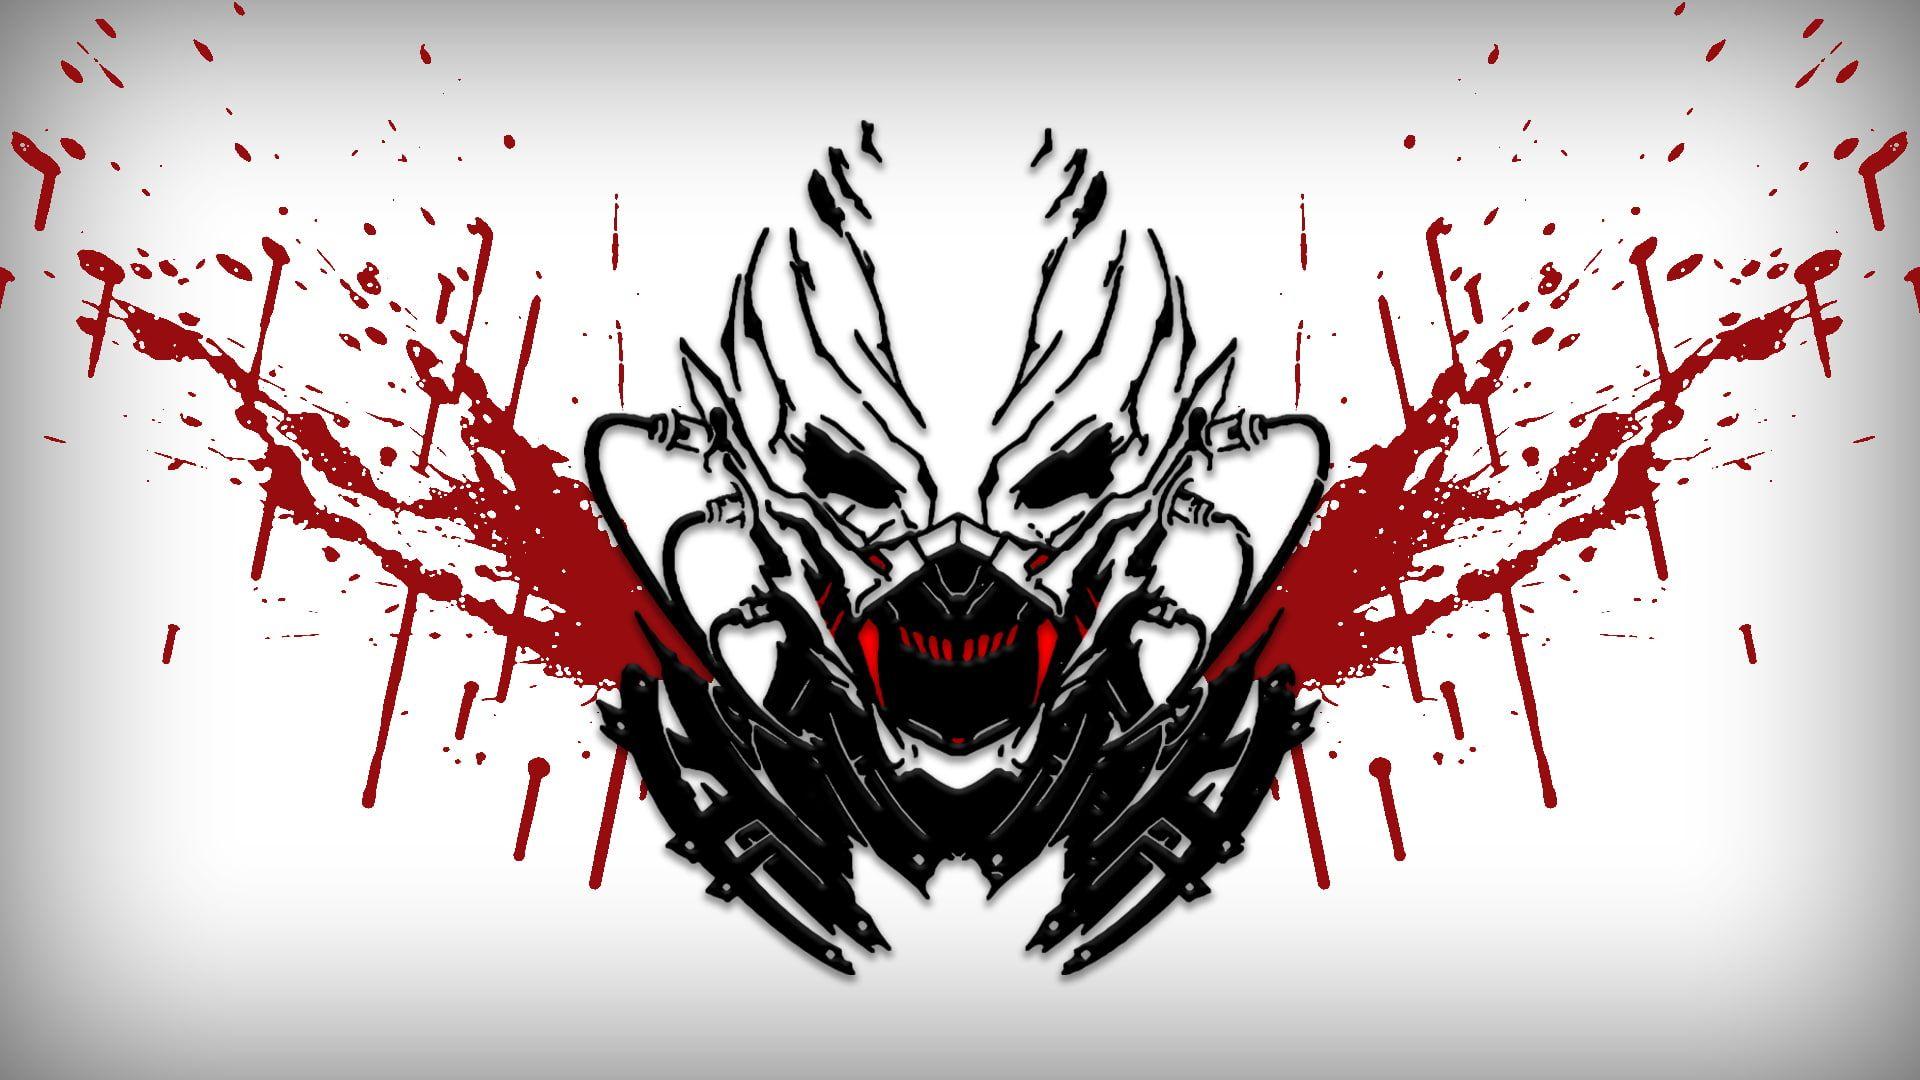 Code Vein Vampire Video Game 1080p Wallpaper Hdwallpaper Desktop Dark Souls Tattoo Hd Wallpaper Wallpaper